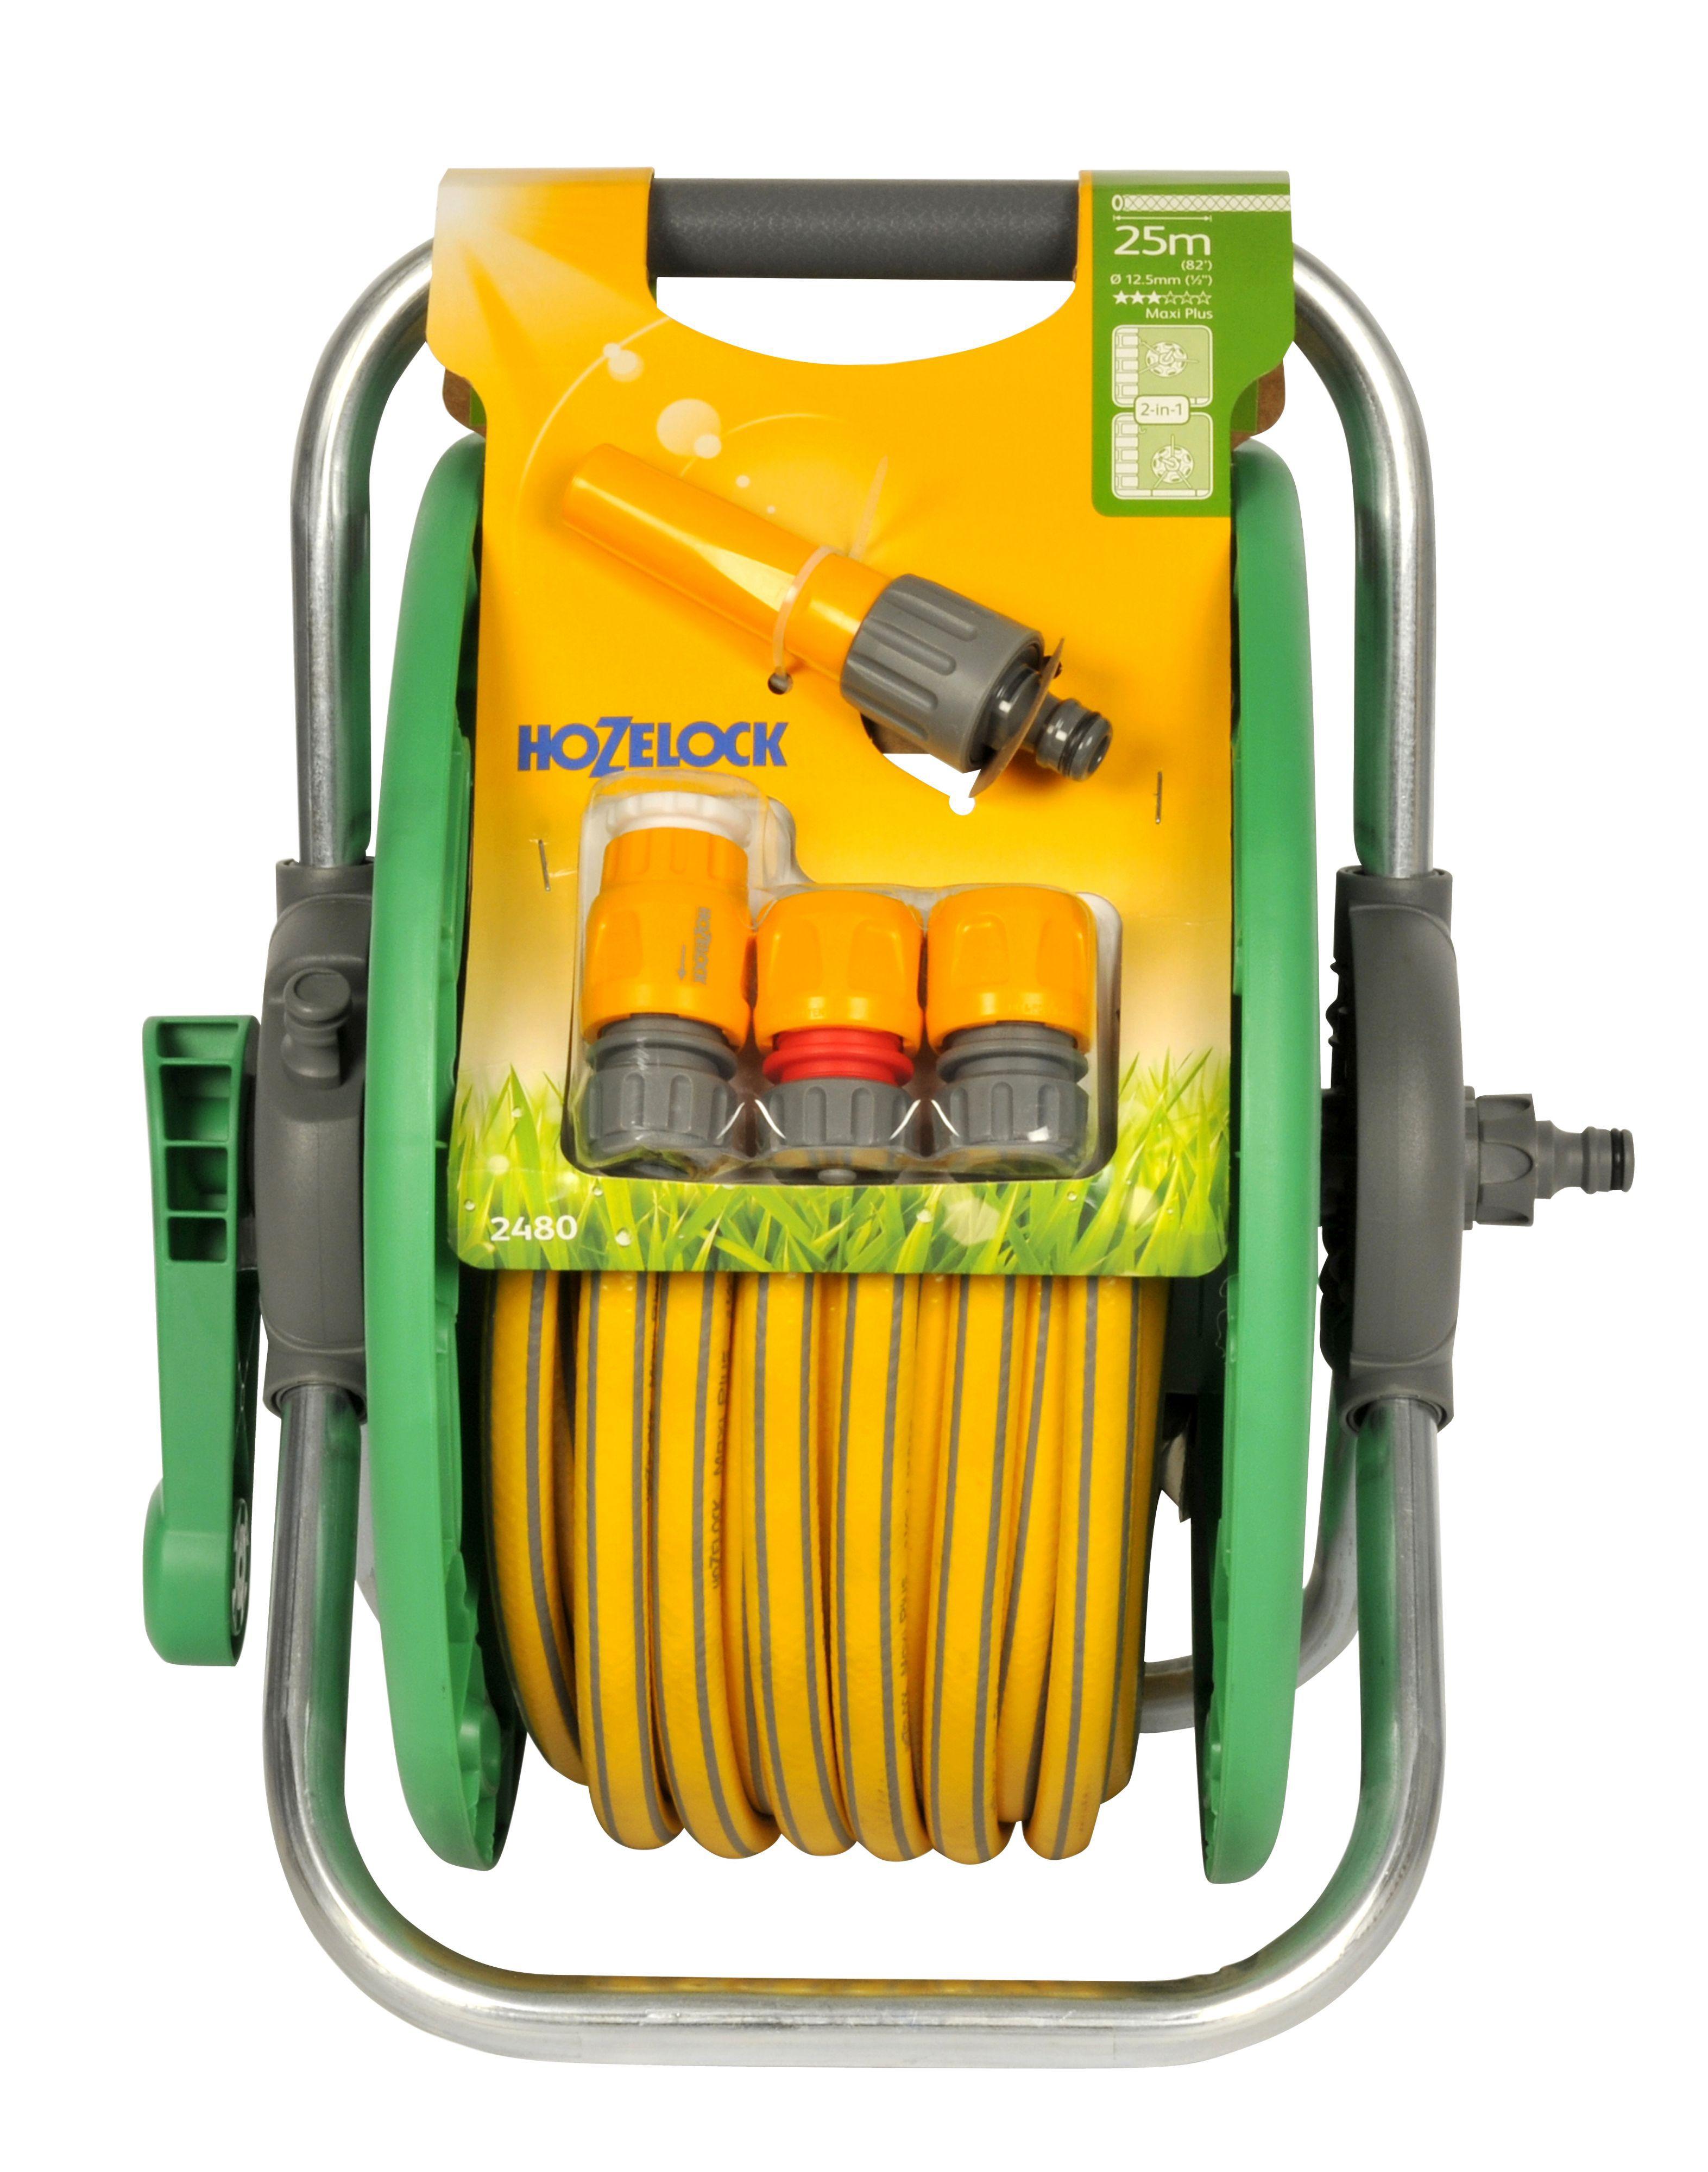 Hozelock Standard Hose Reel & Hose Cart (L)25 M | Departments | DIY ...